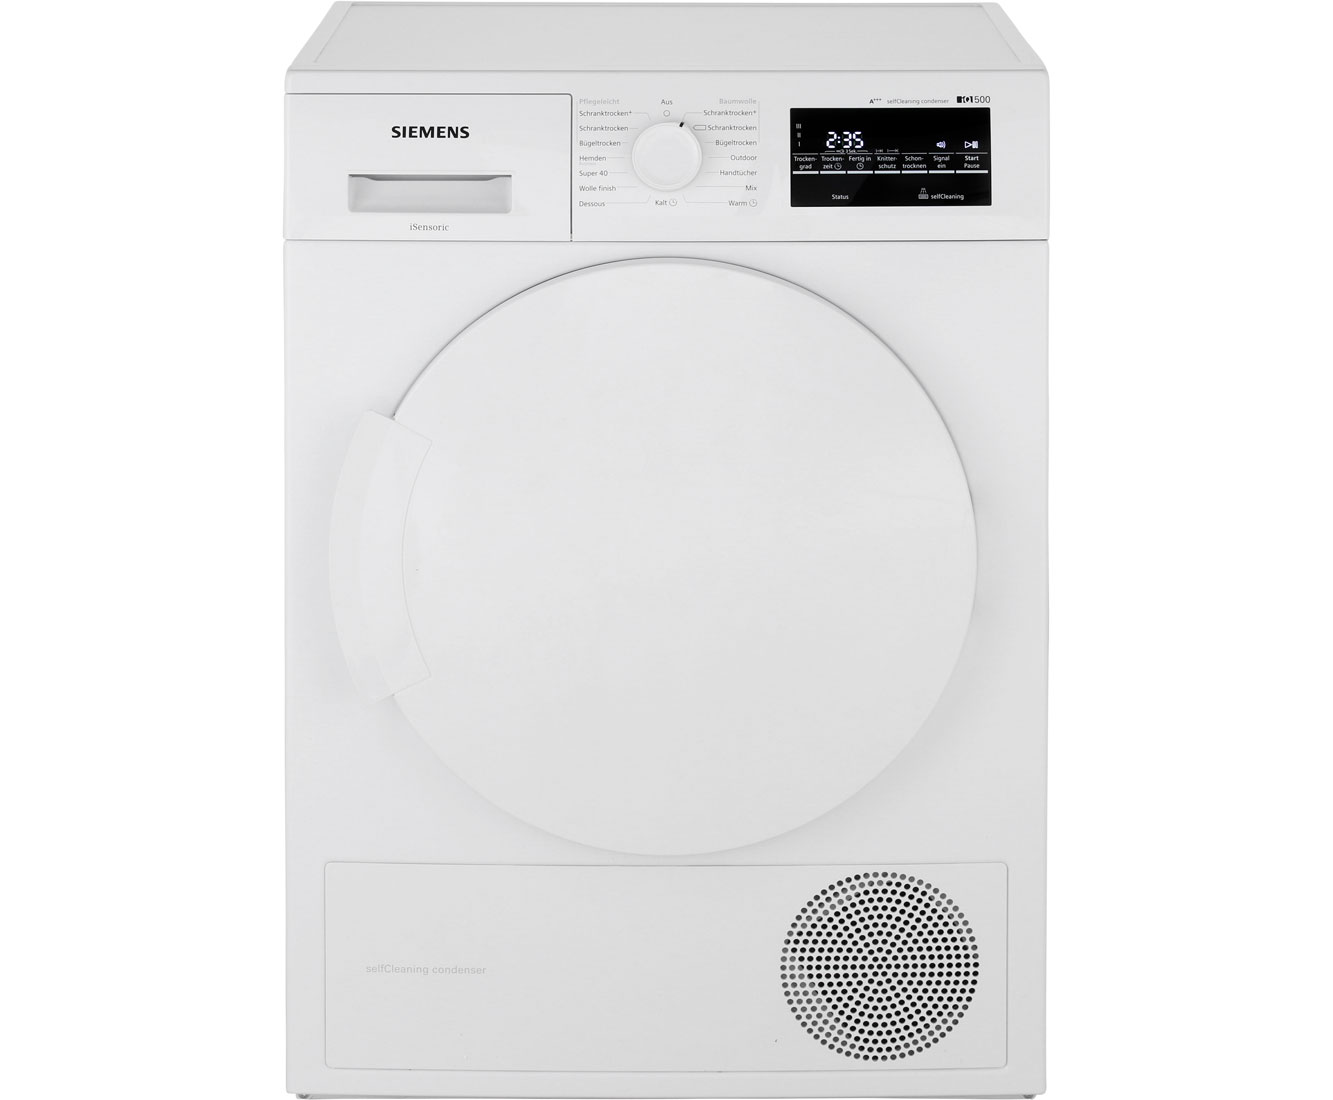 Siemens iQ500 WT45W463 Wärmepumpentrockner - Weiss | Bad > Waschmaschinen und Trockner | Weiss | Siemens